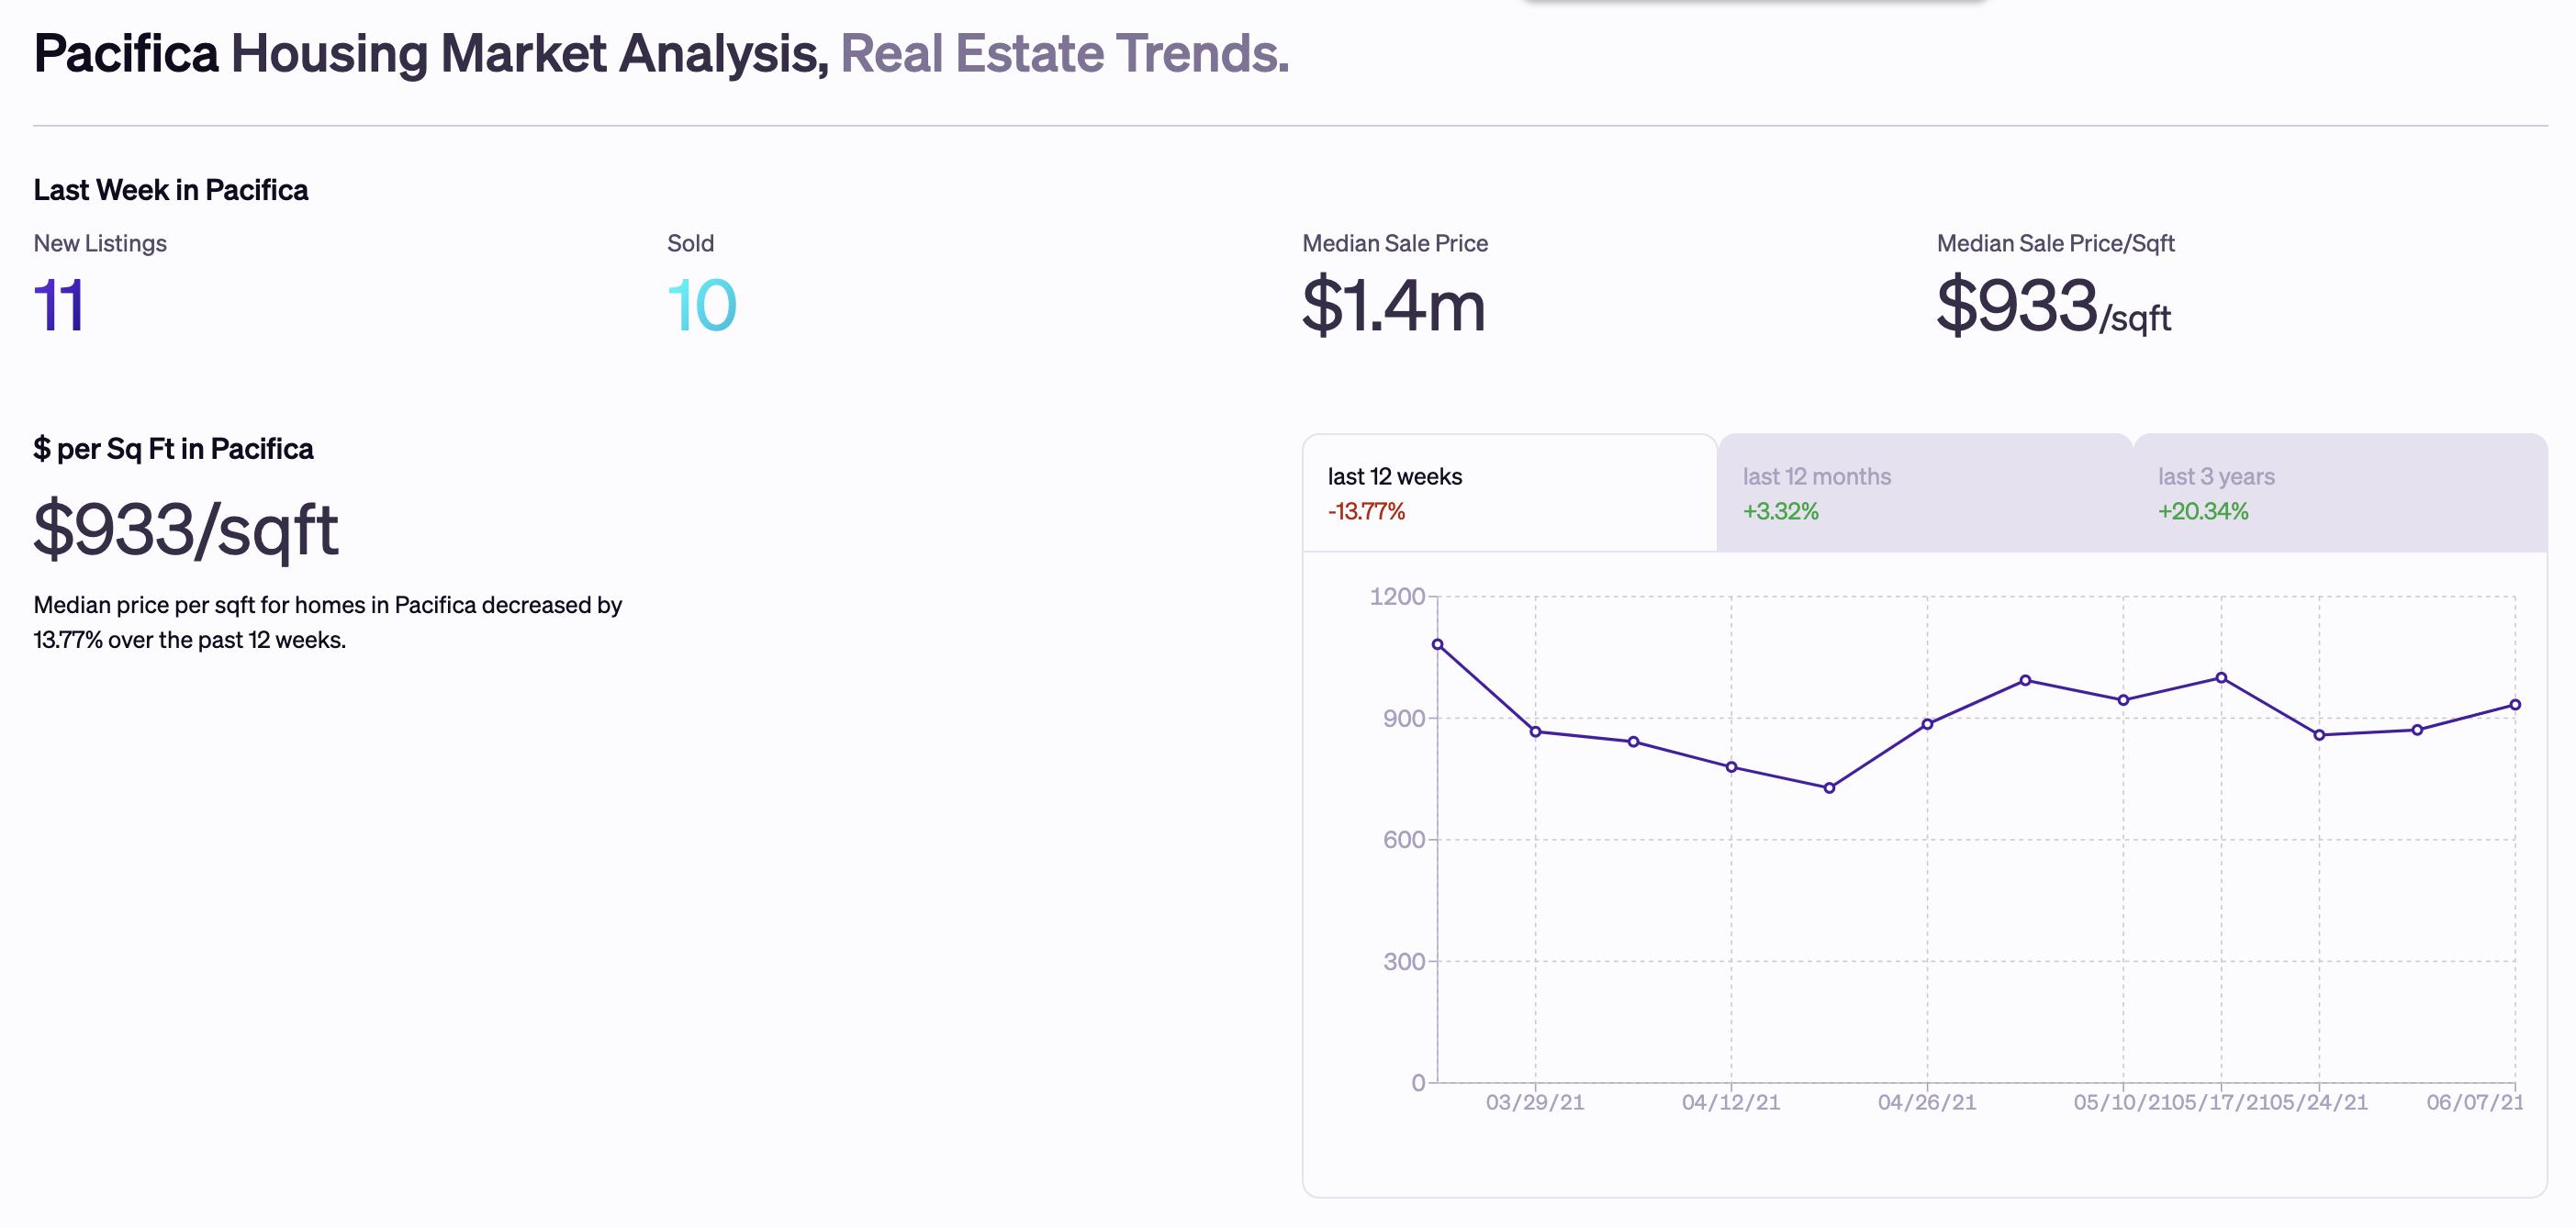 Real estate pacifica market trends graph